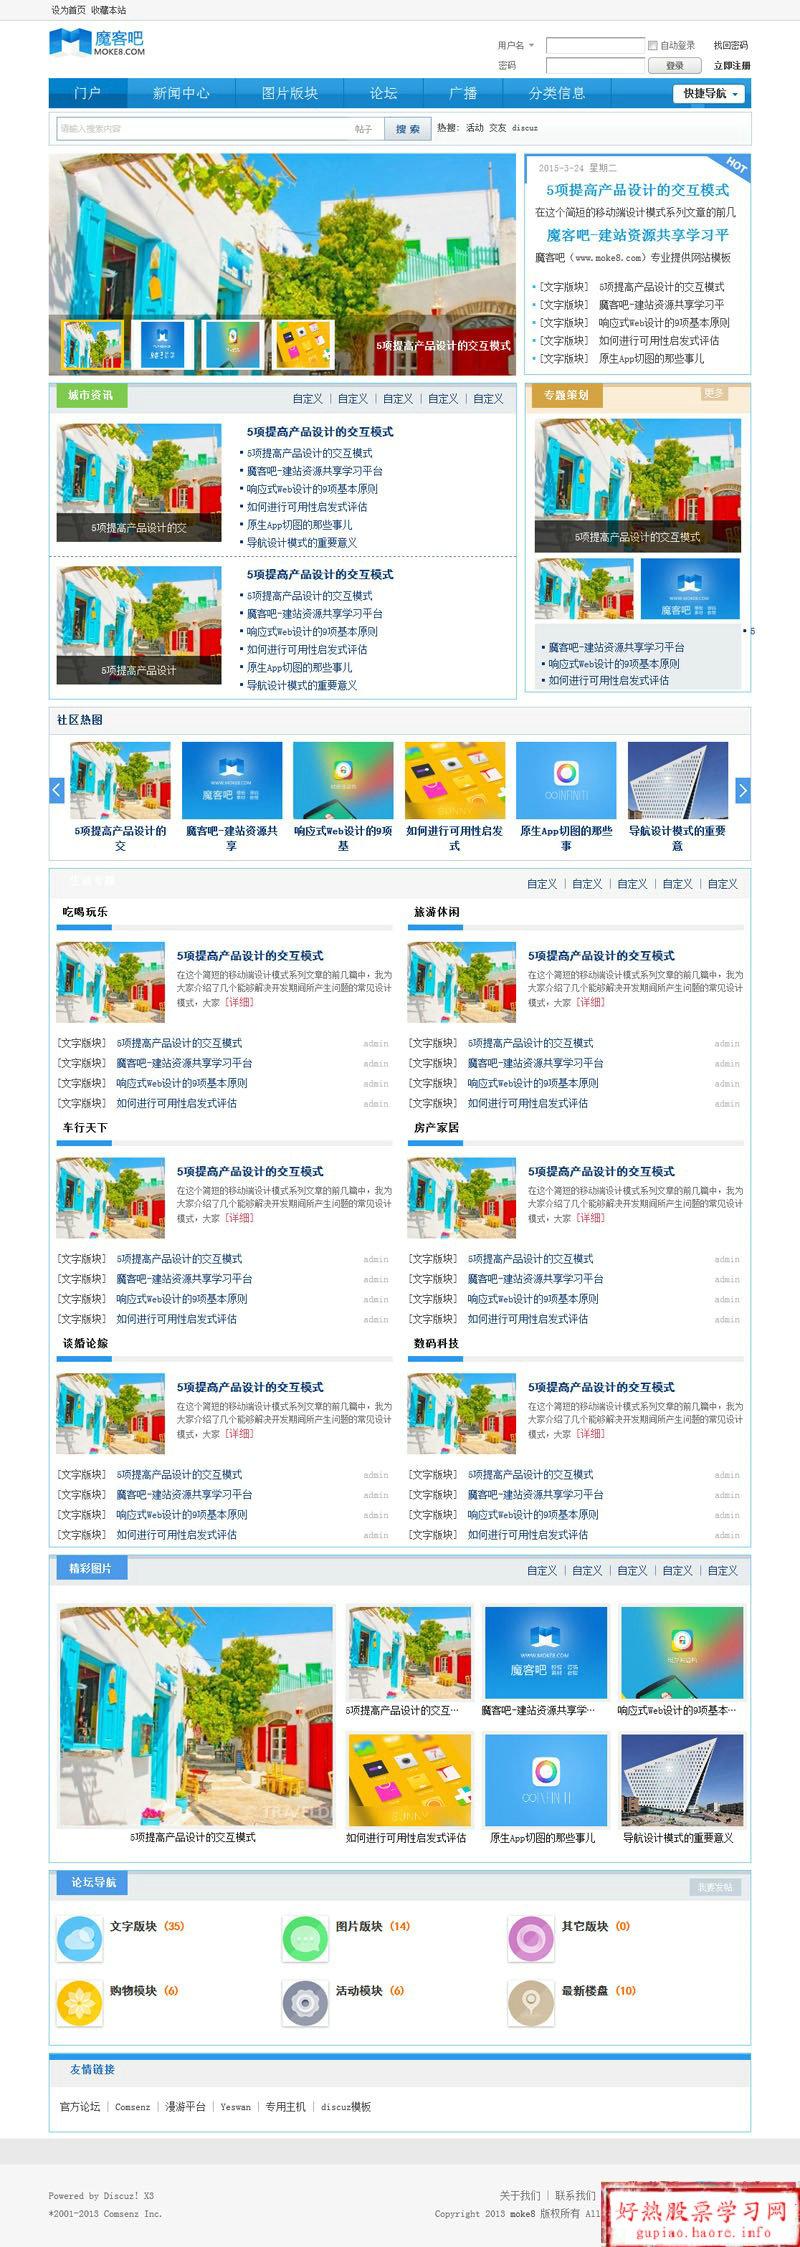 discuz模板:蓝色大众地方门户模板免费下载